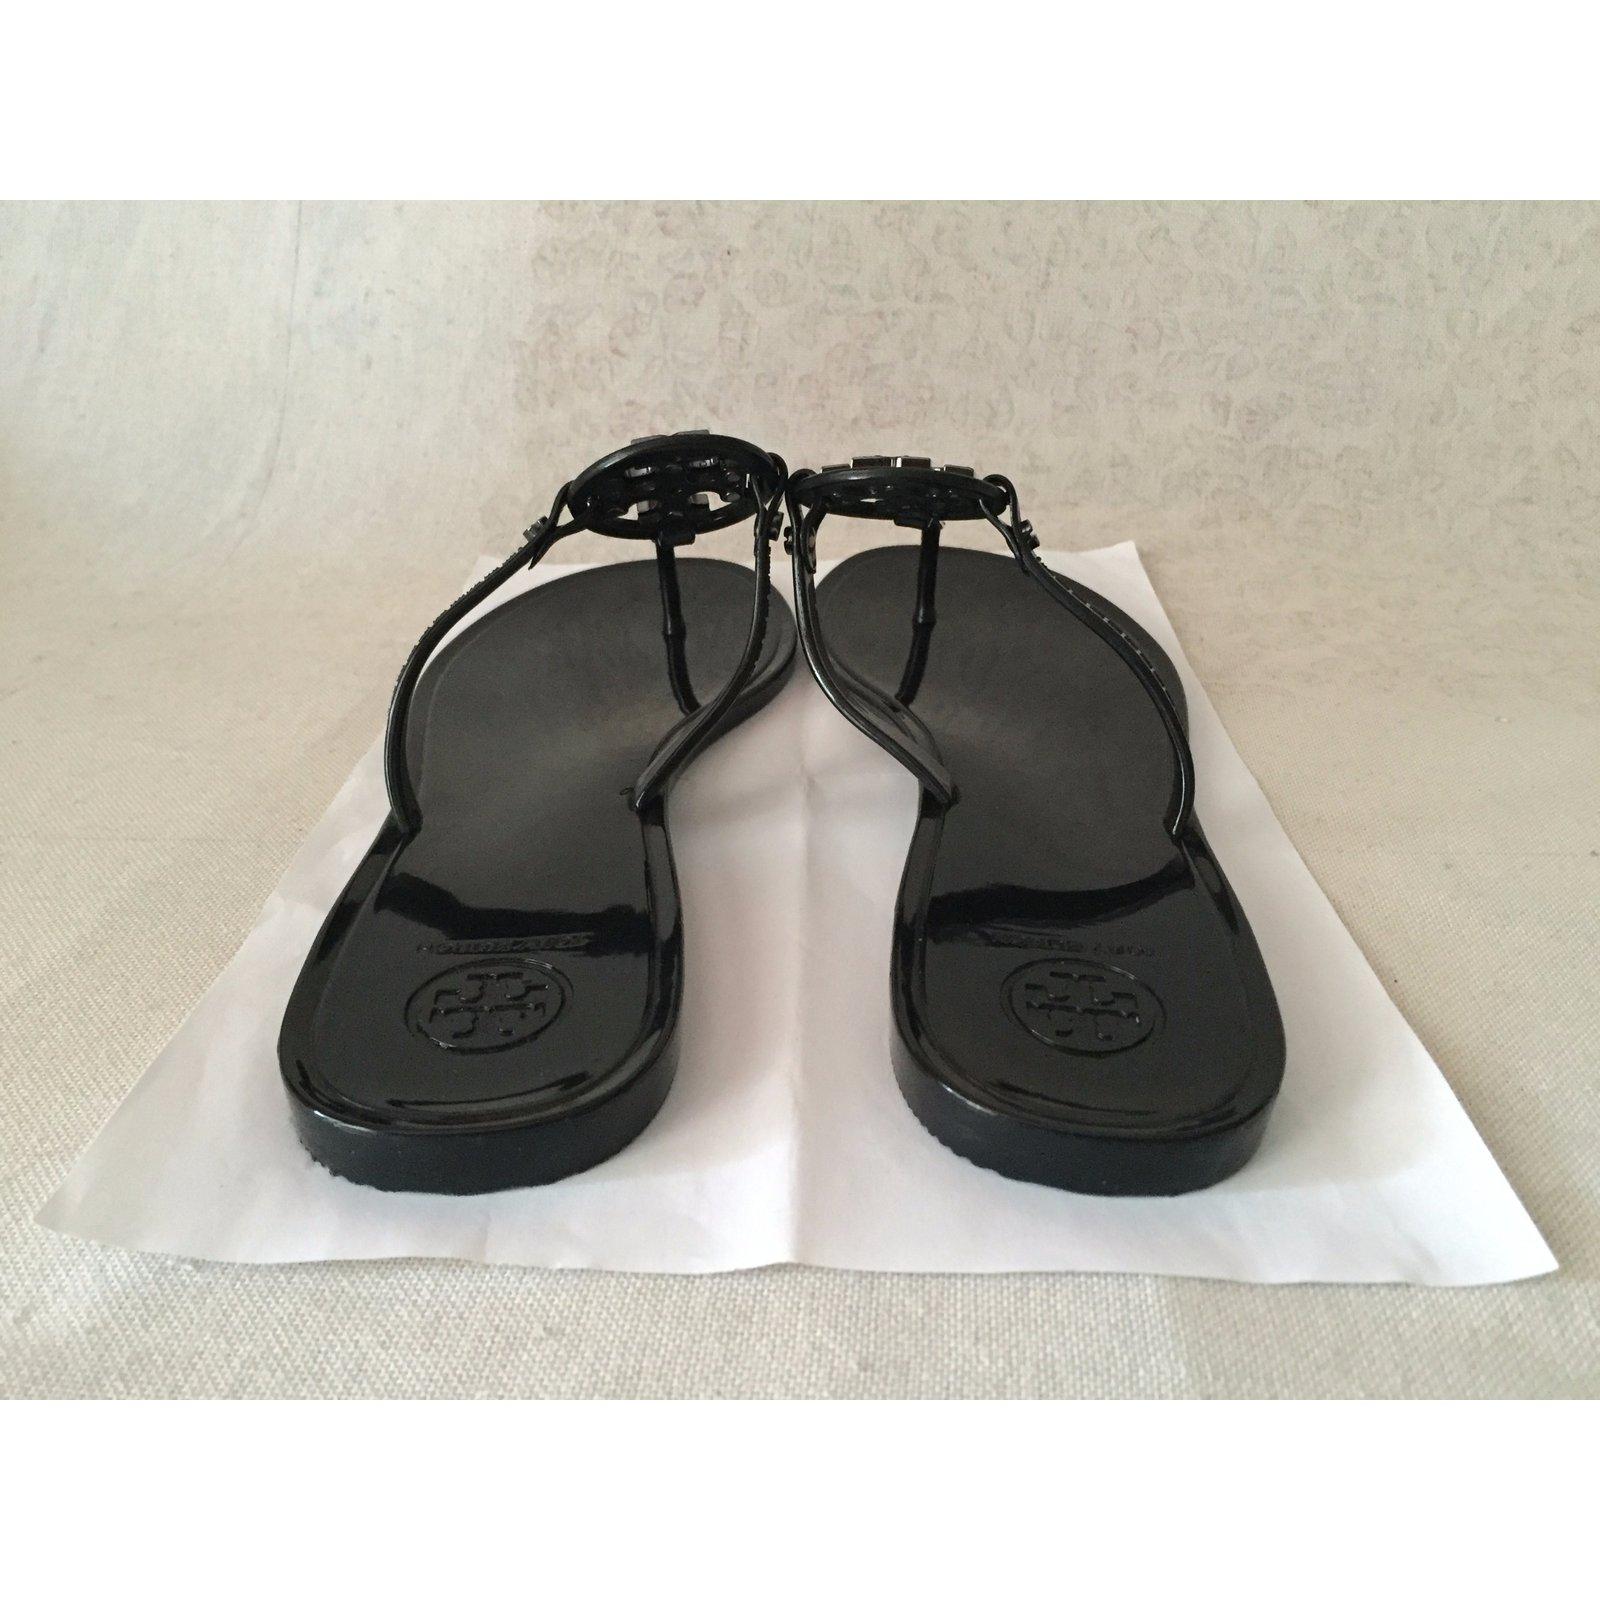 e2b6e85be05 Facebook · Pin This. Tory Burch Sandals Sandals Plastic Black ref.34336